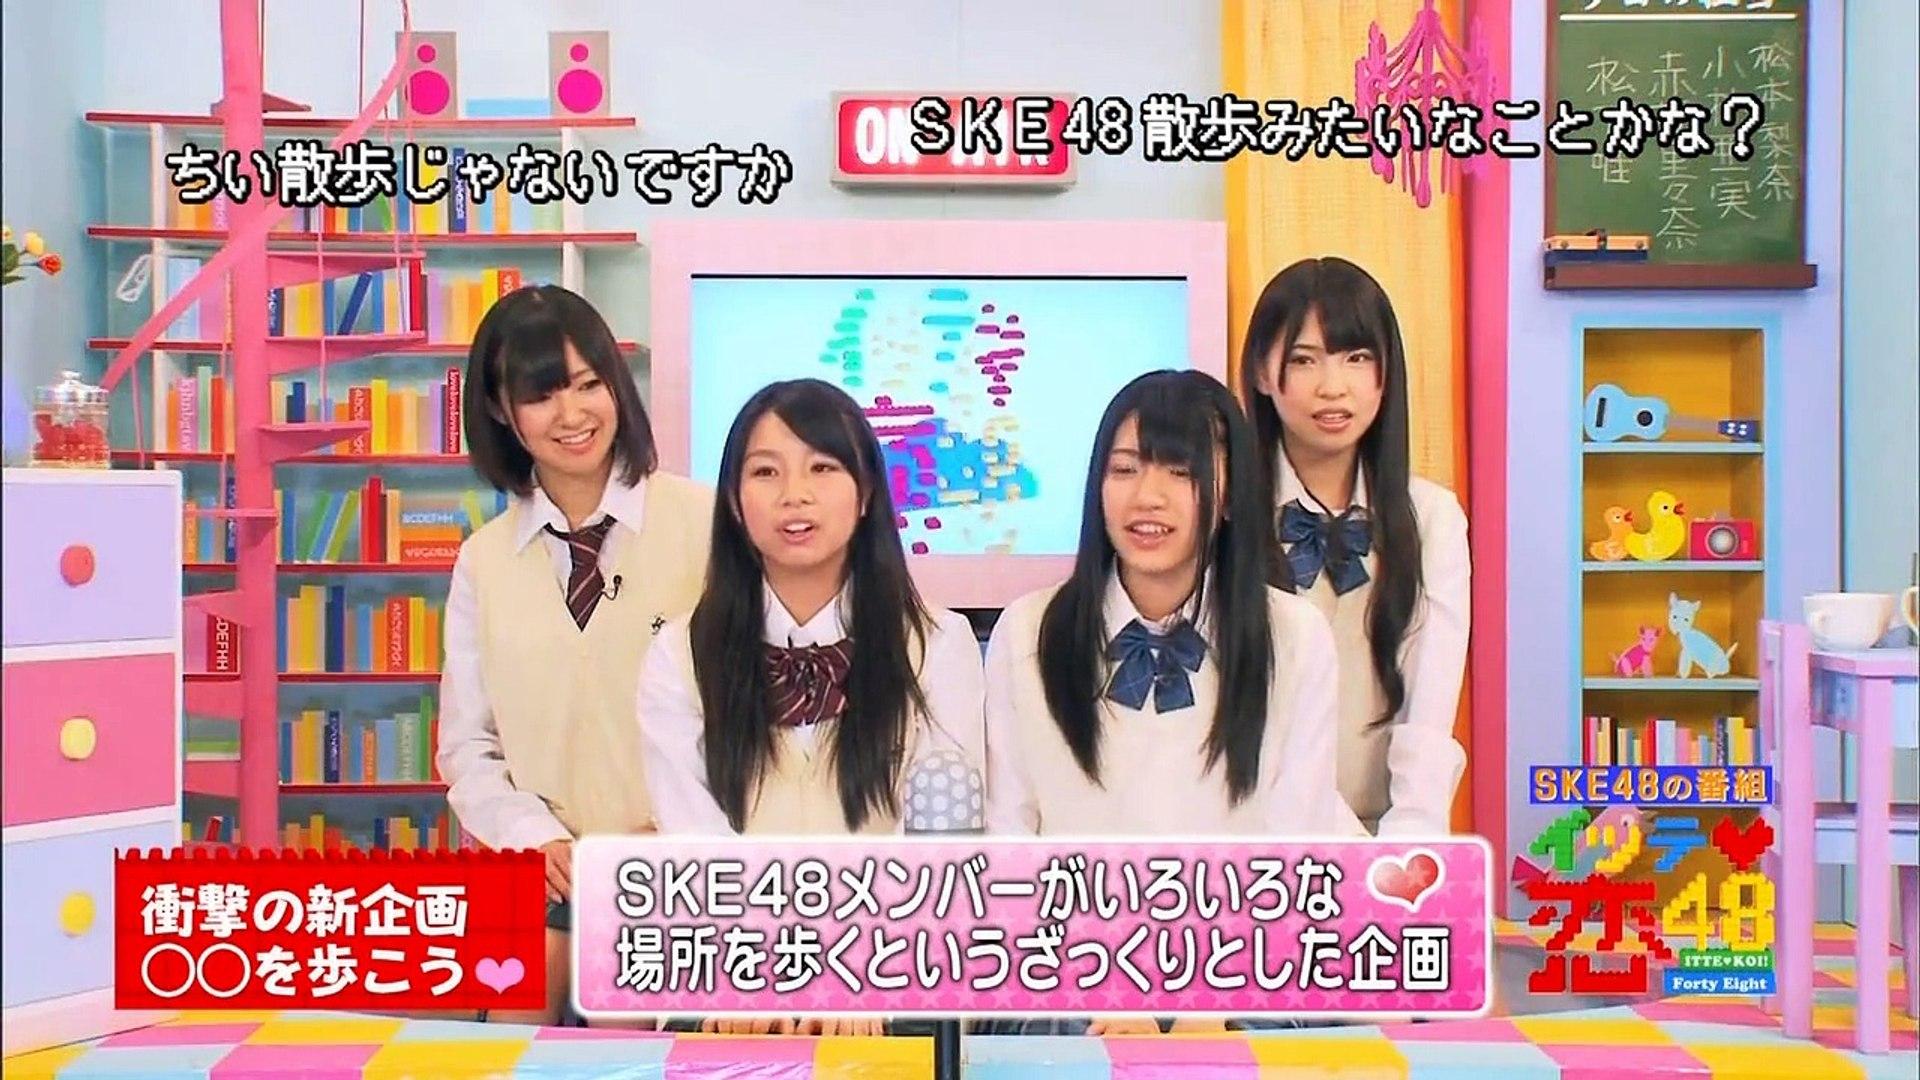 SKE48 イッテ♡恋48 ep07 2011.06.12 松下唯、赤枝里々奈、松本梨奈 ...